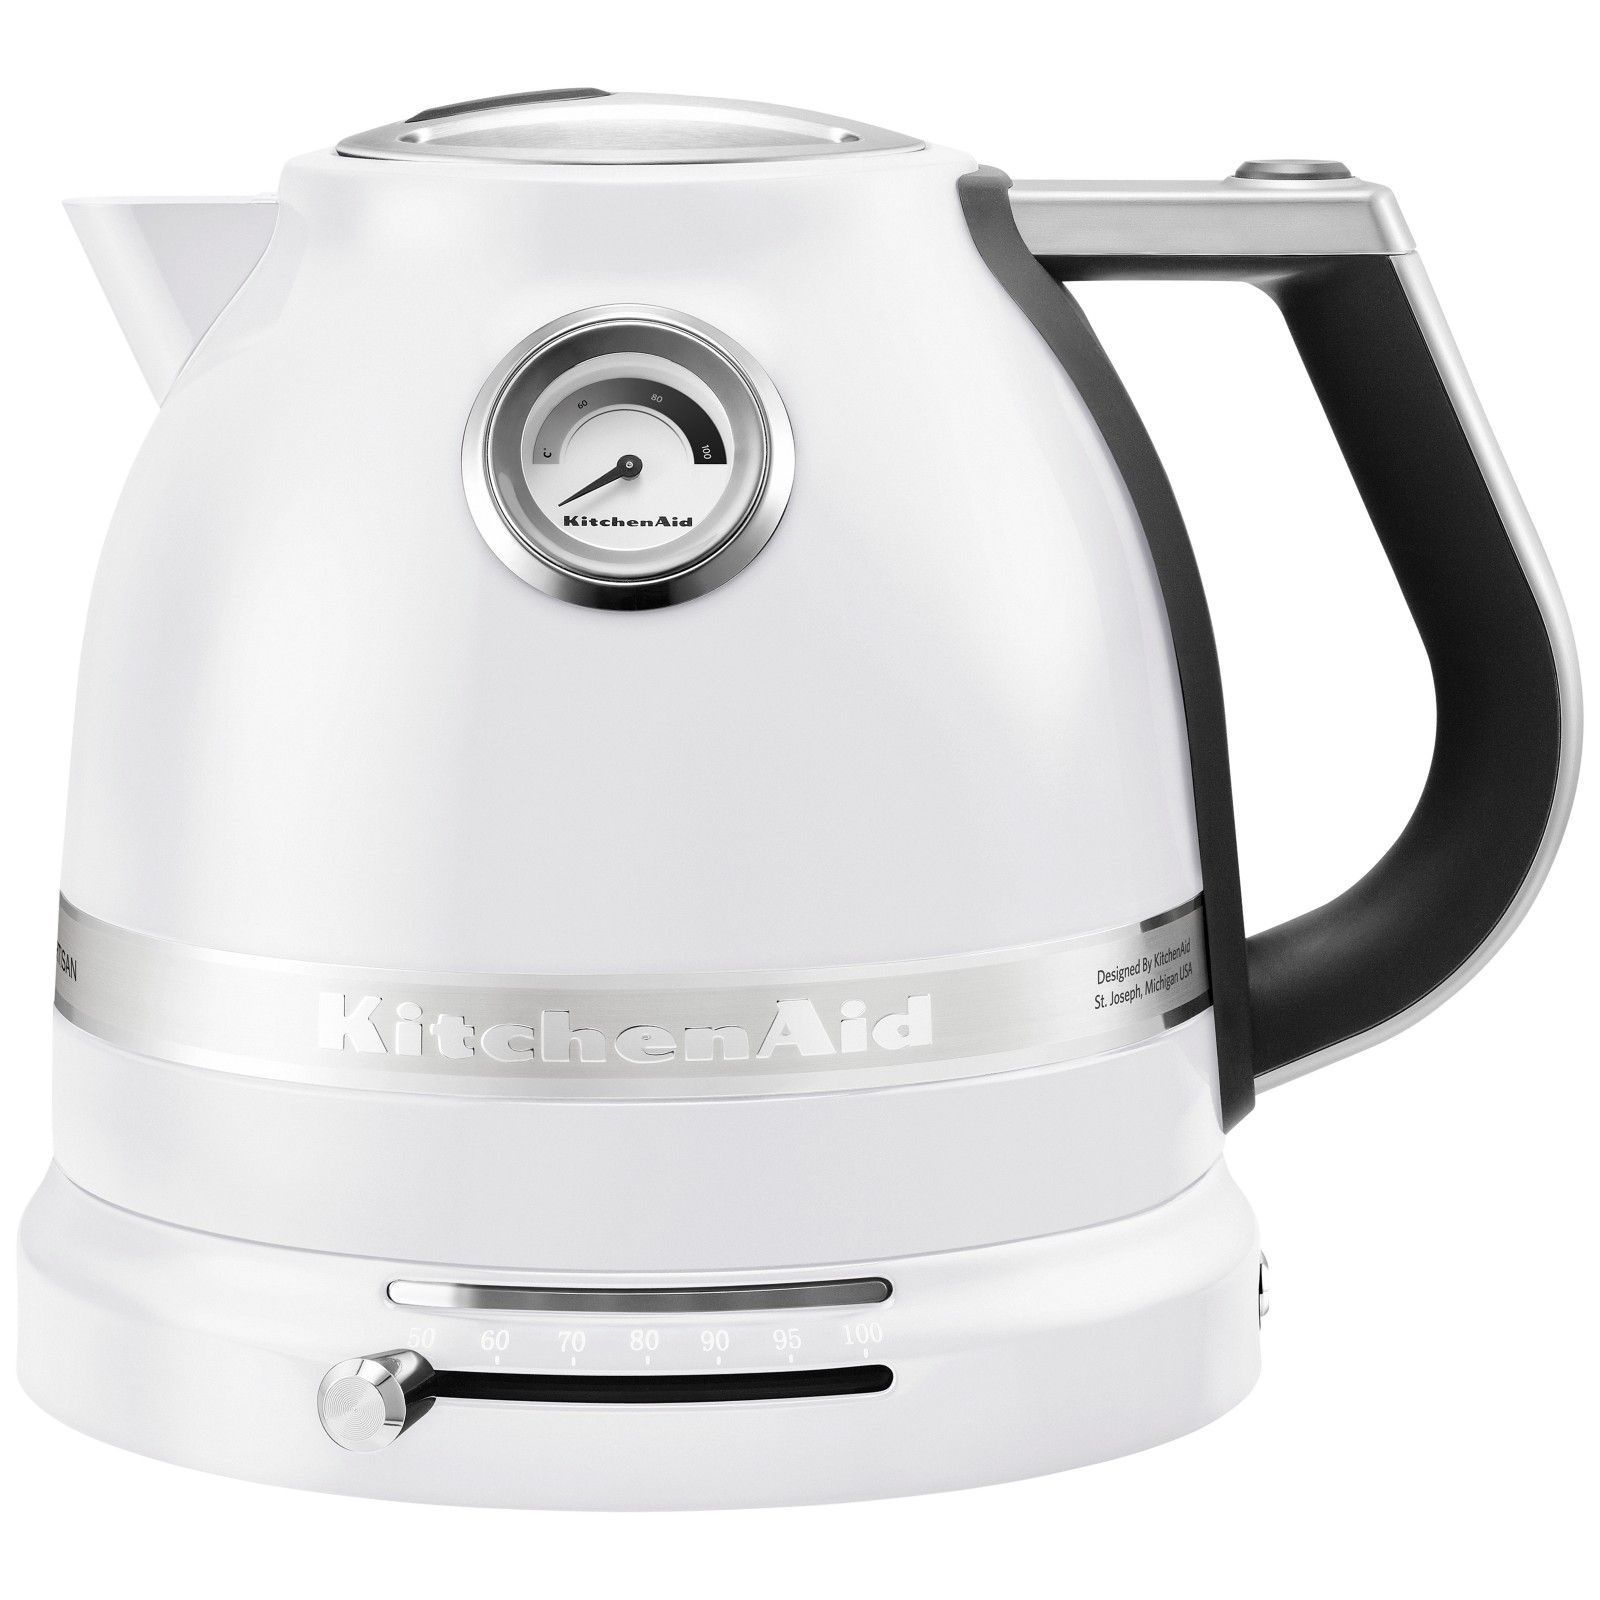 Buy KitchenAid Artisan Kettle | John Lewis | Home | Pinterest ... on